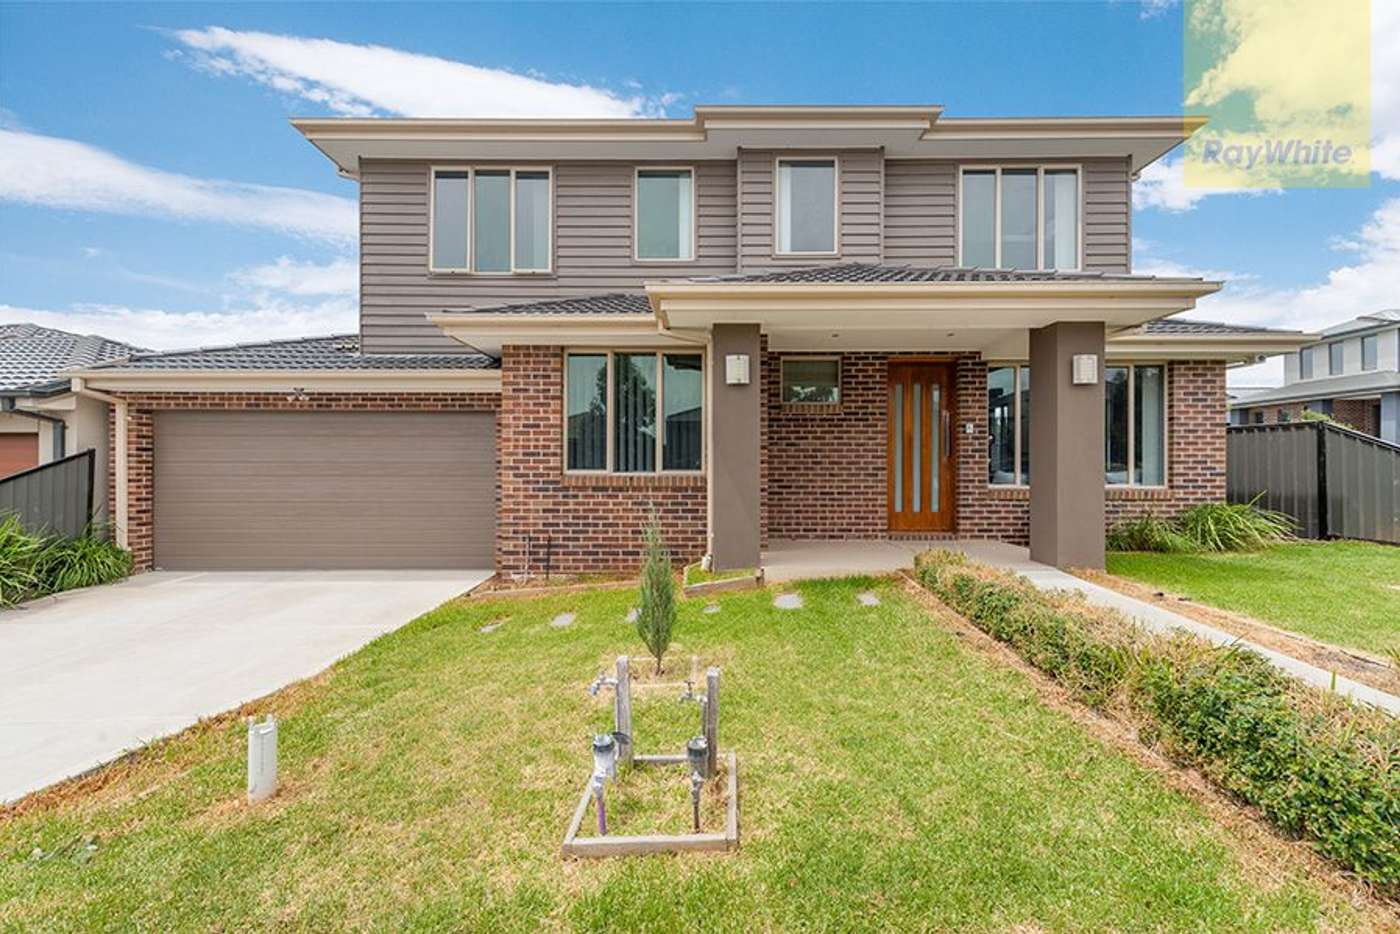 Main view of Homely house listing, 46 Natural Drive, Craigieburn VIC 3064